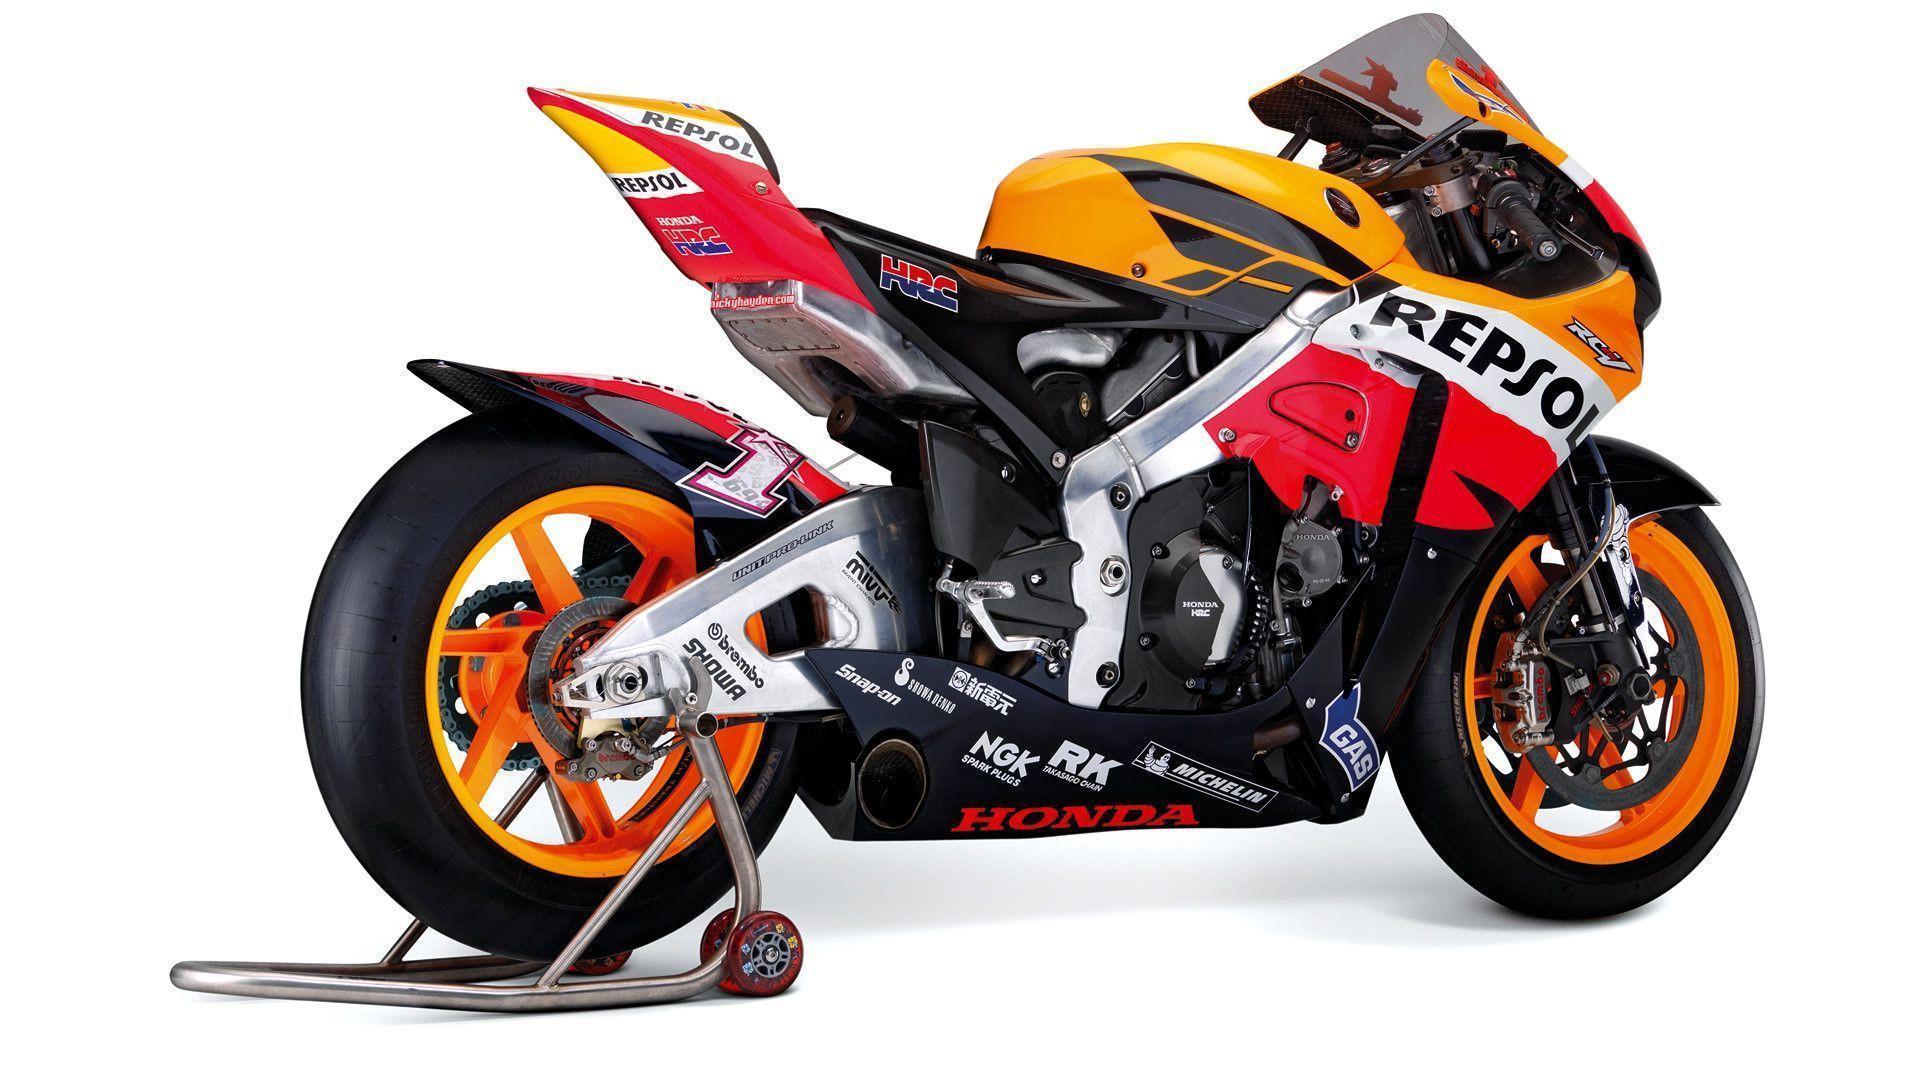 Moto GP Bikes Wallpapers 1920x1080